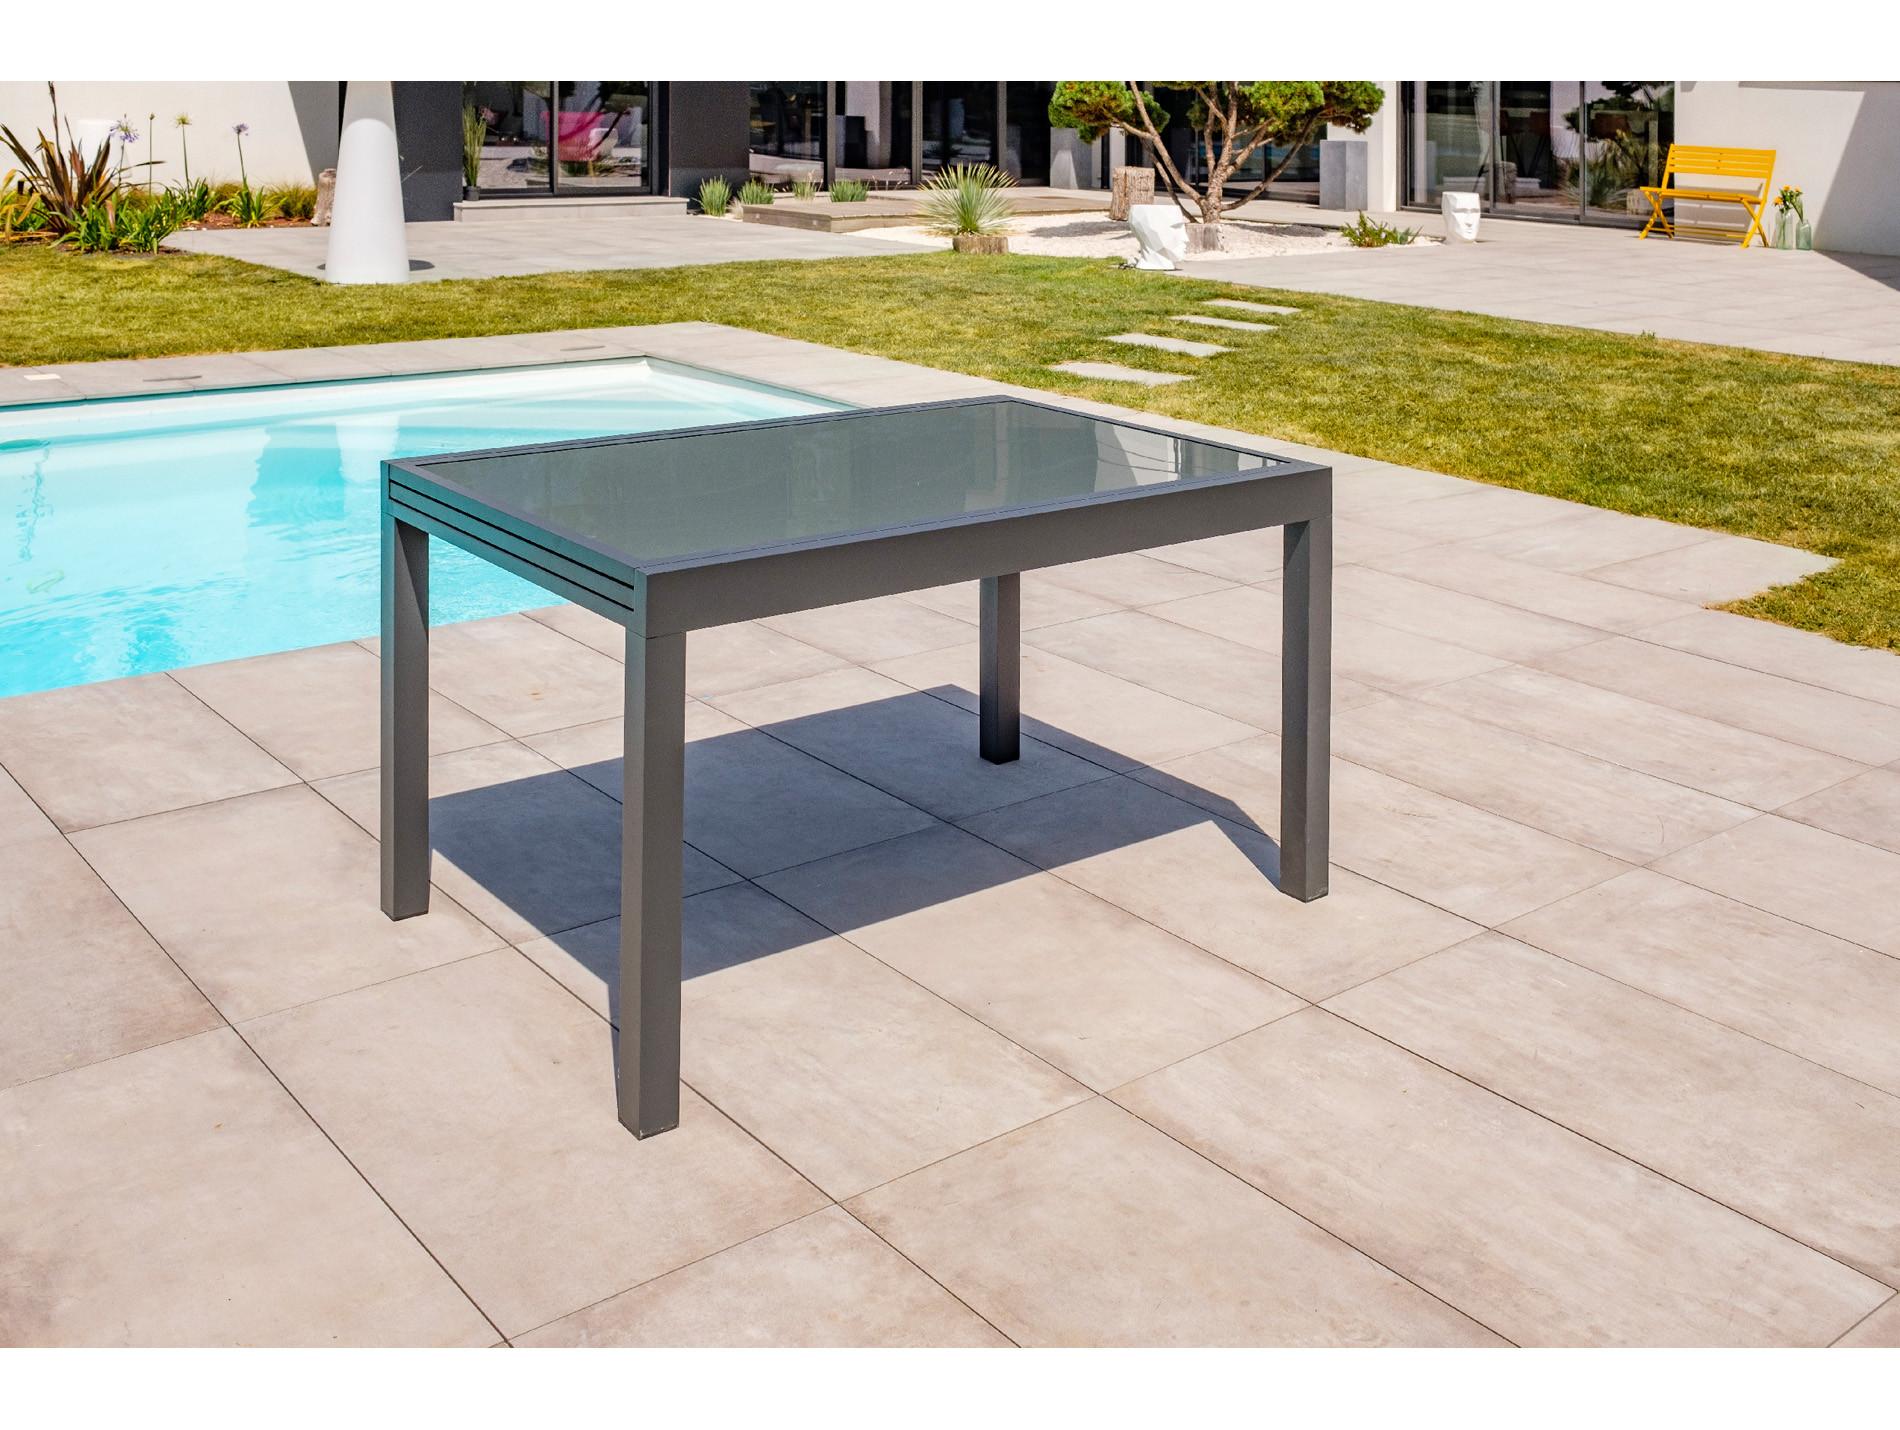 Table de jardin alu et verre 4/8 places Tolede Anthracite